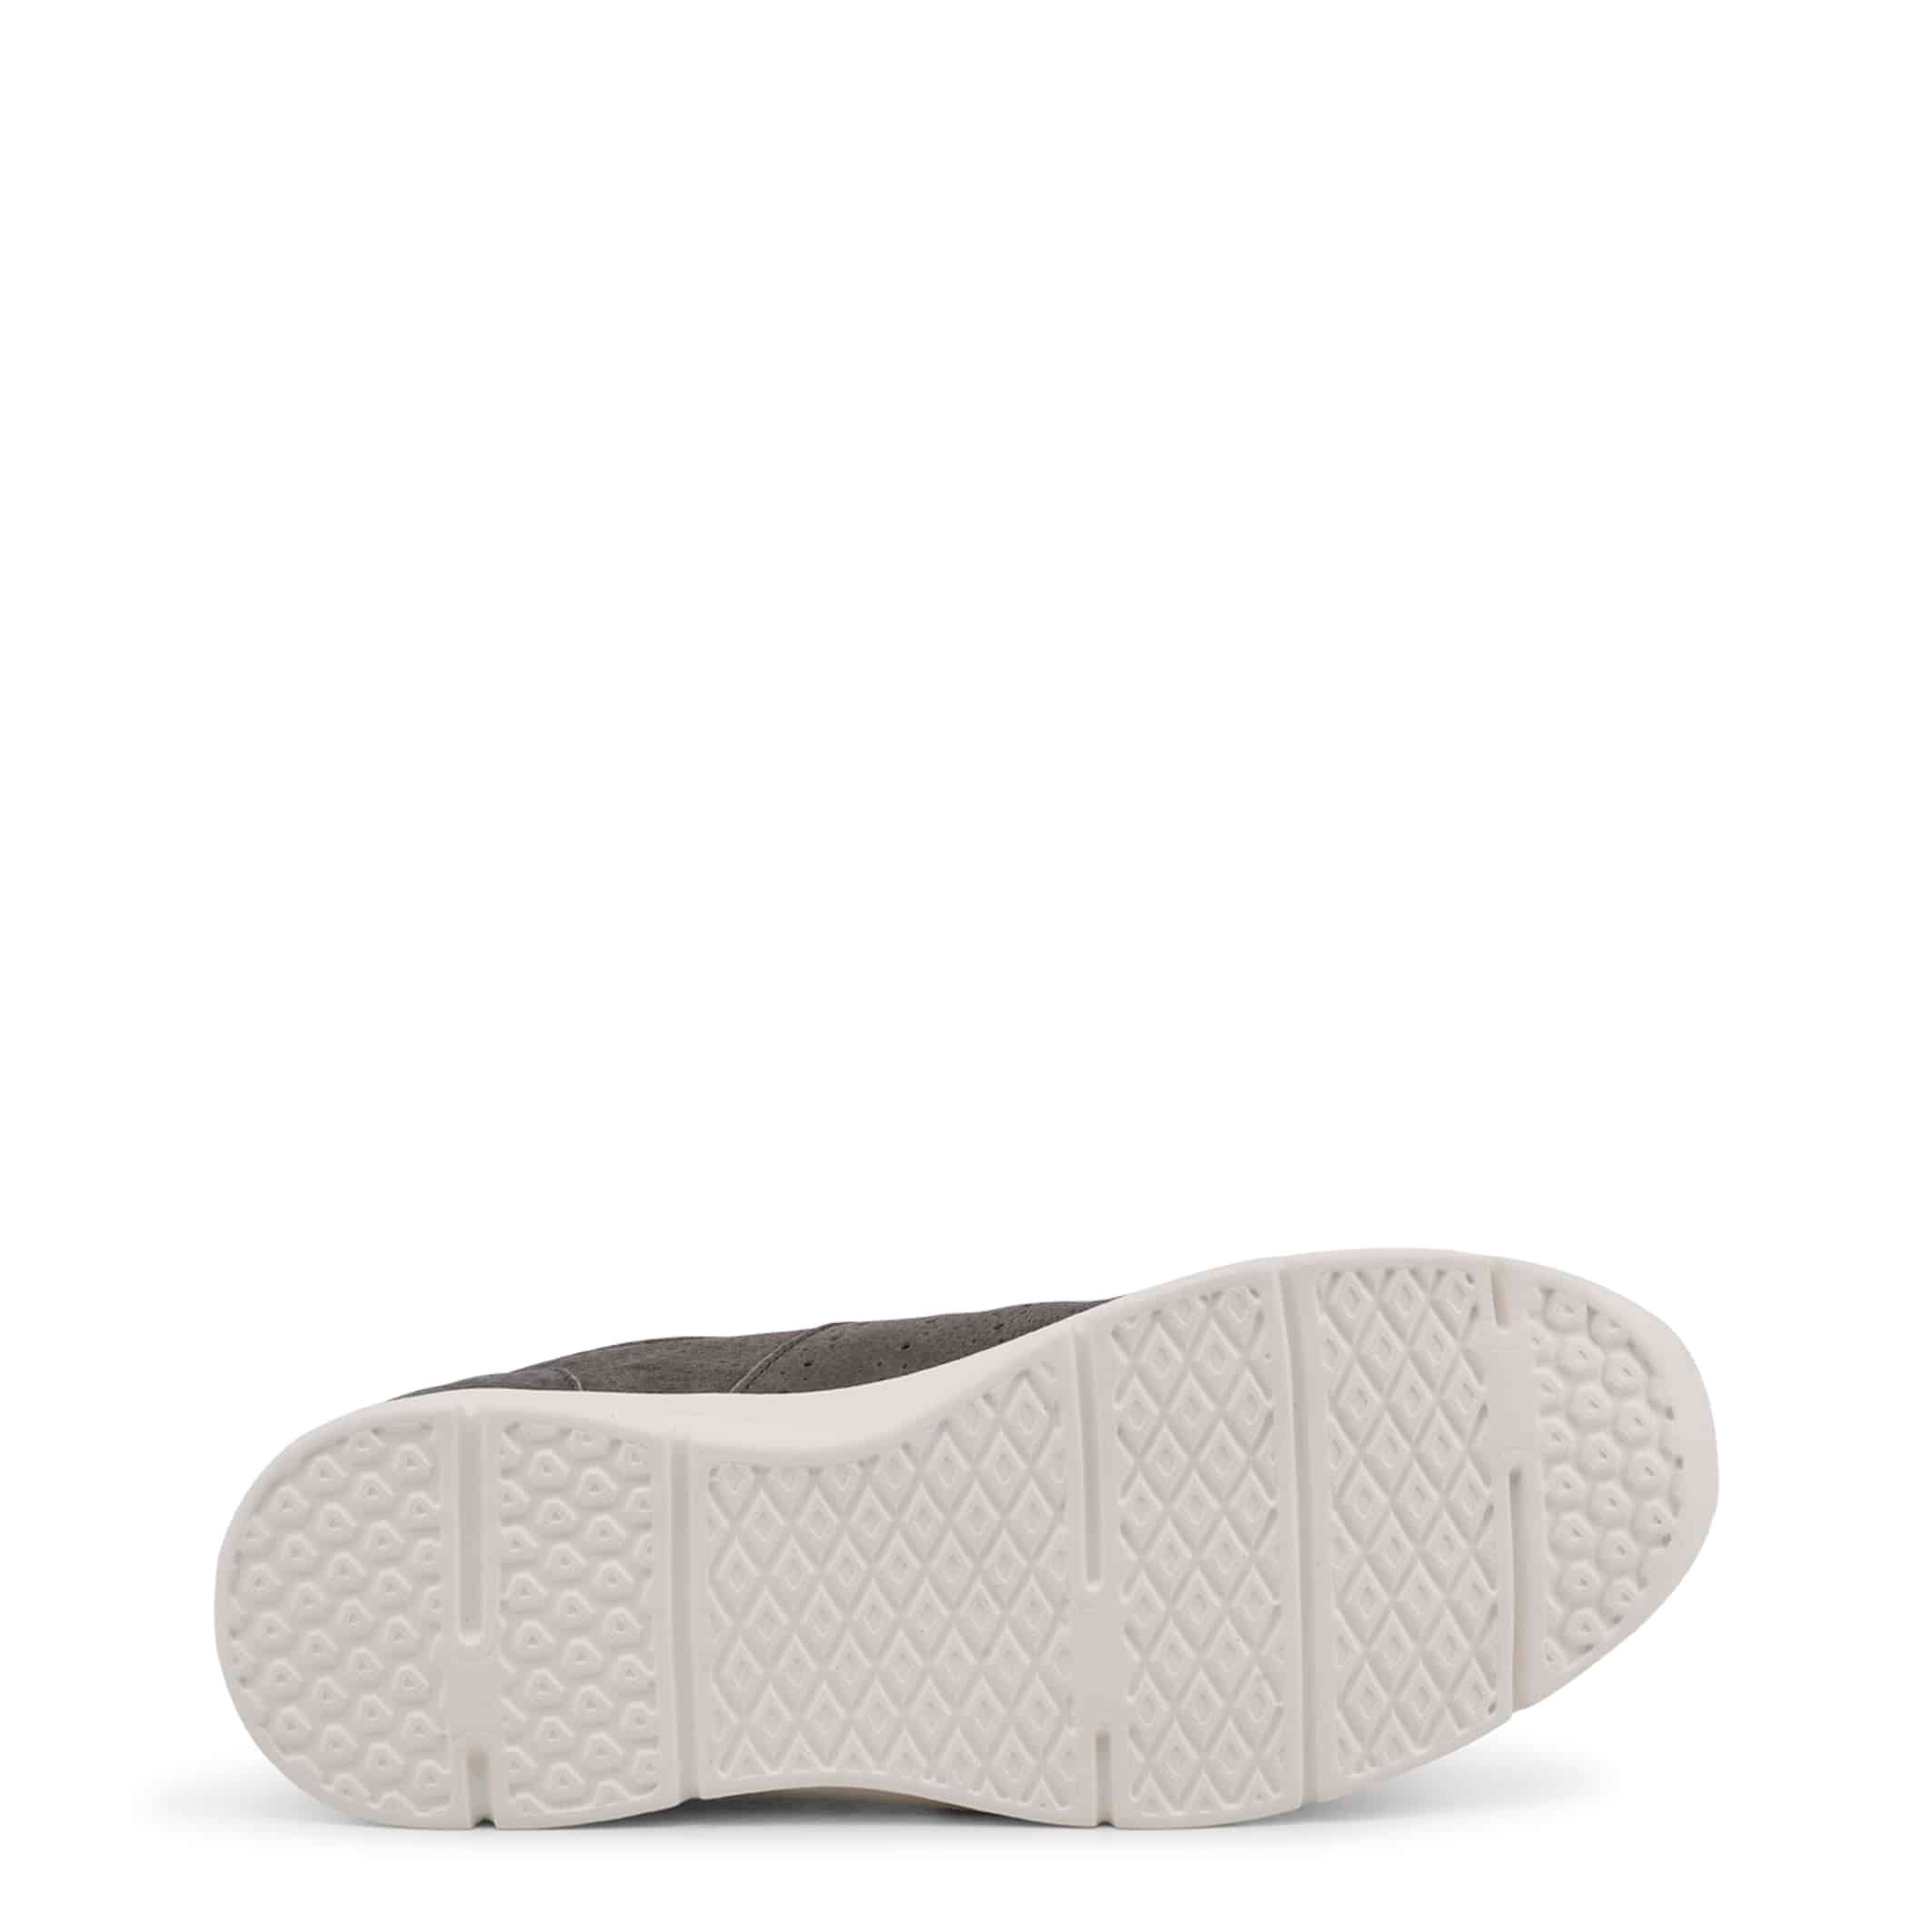 Sneakers U.S. Polo Assn. – WALDO4080S8_S1